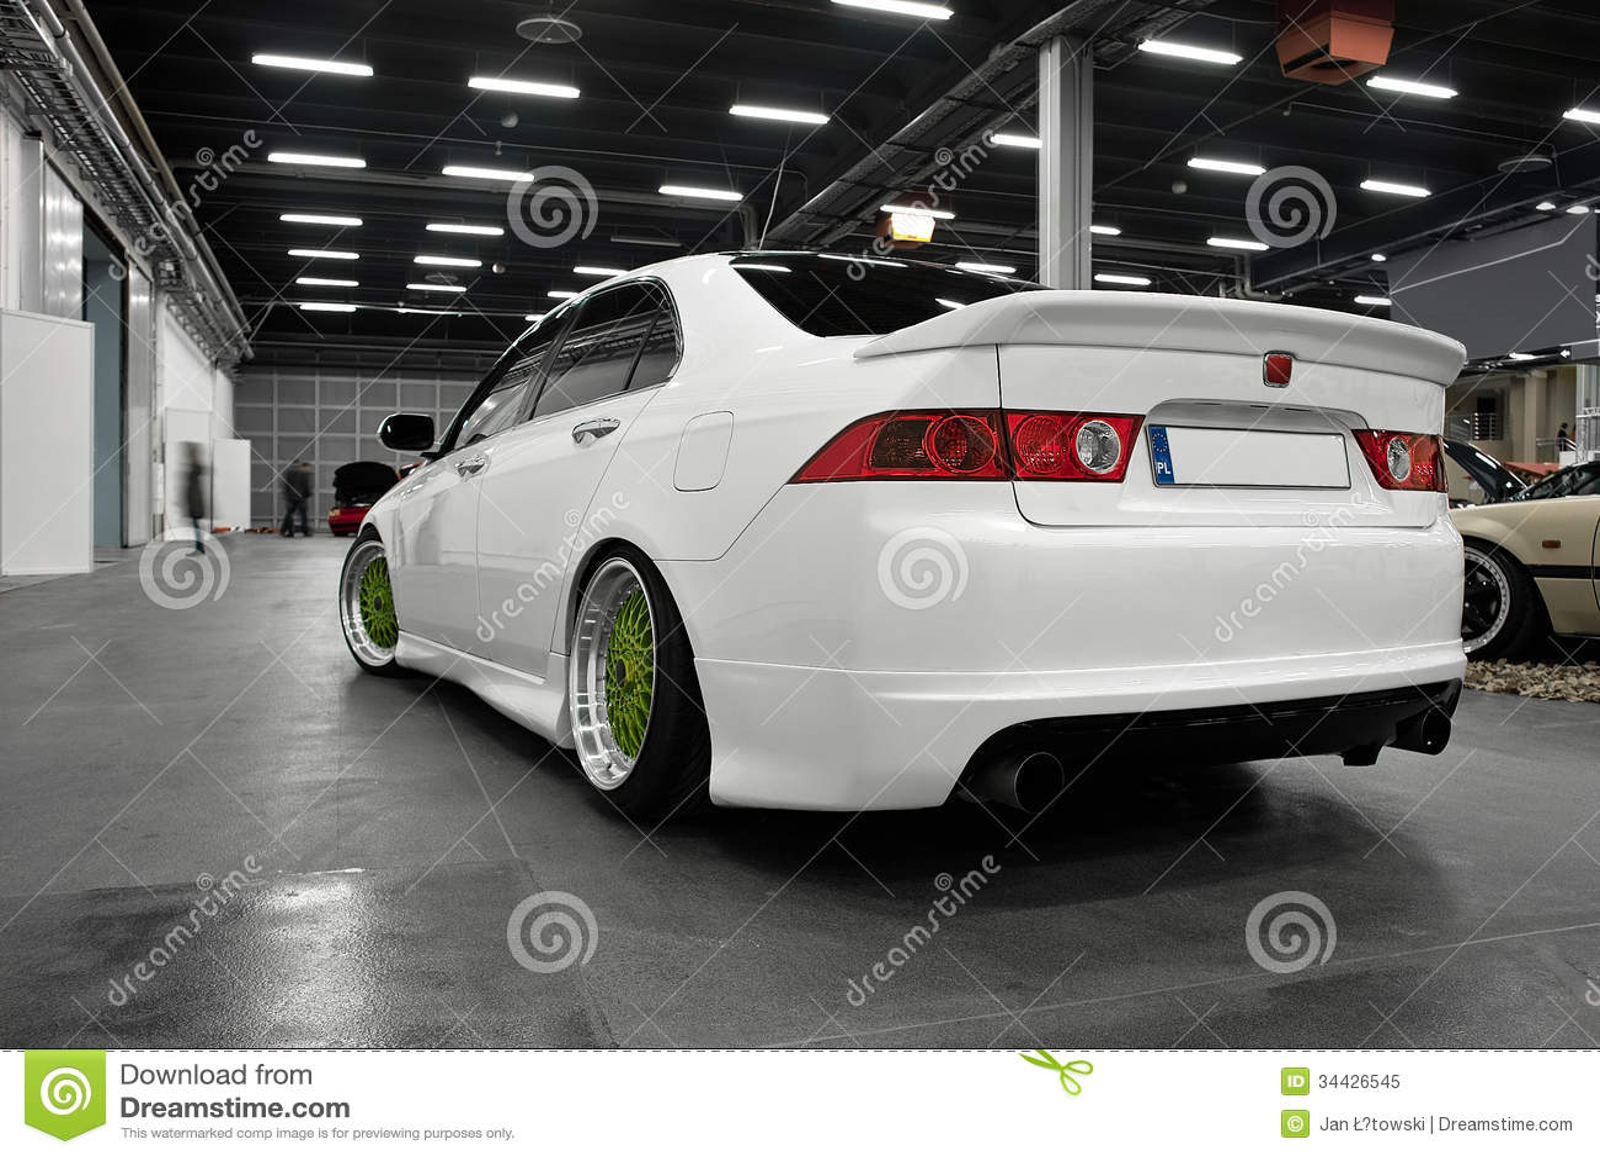 Japan sport car honda accord stock image image 34426545 for Fastest honda accord